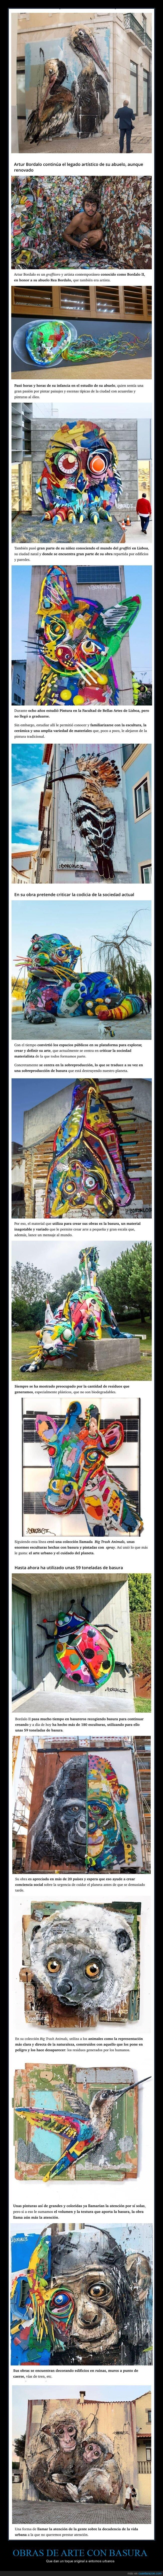 basura,obras de arte